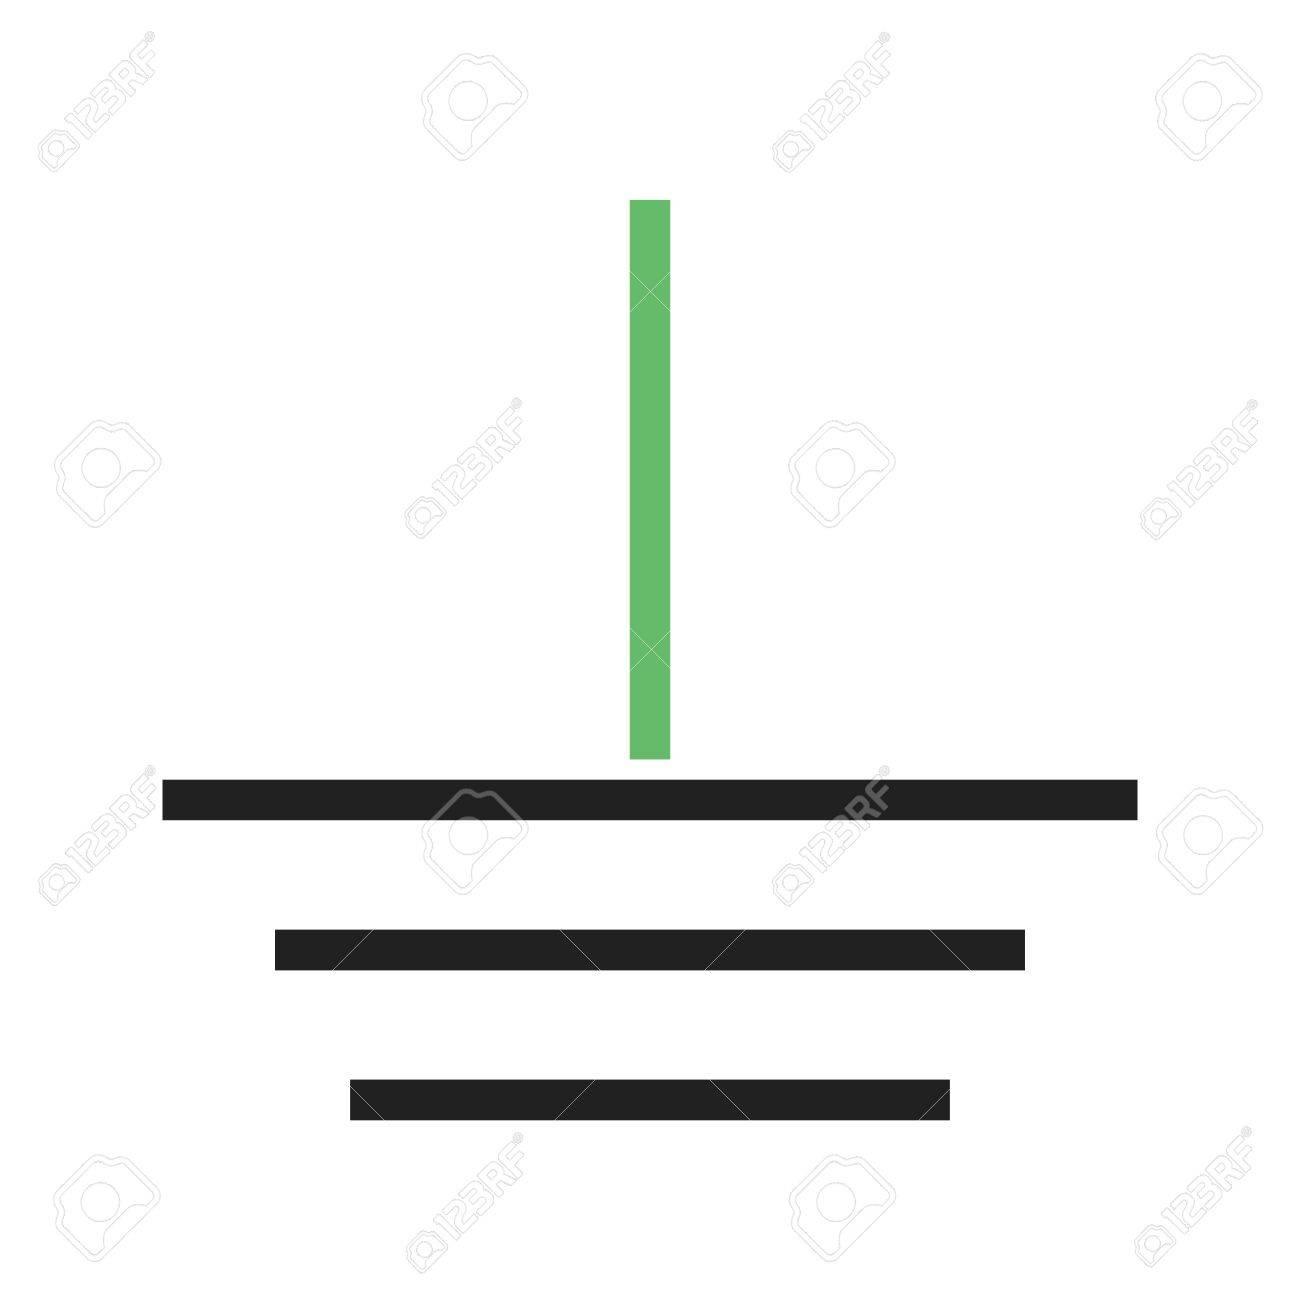 Elektriker, Draht, Erde Symbol Vektor-Bild. Kann Auch Für ...